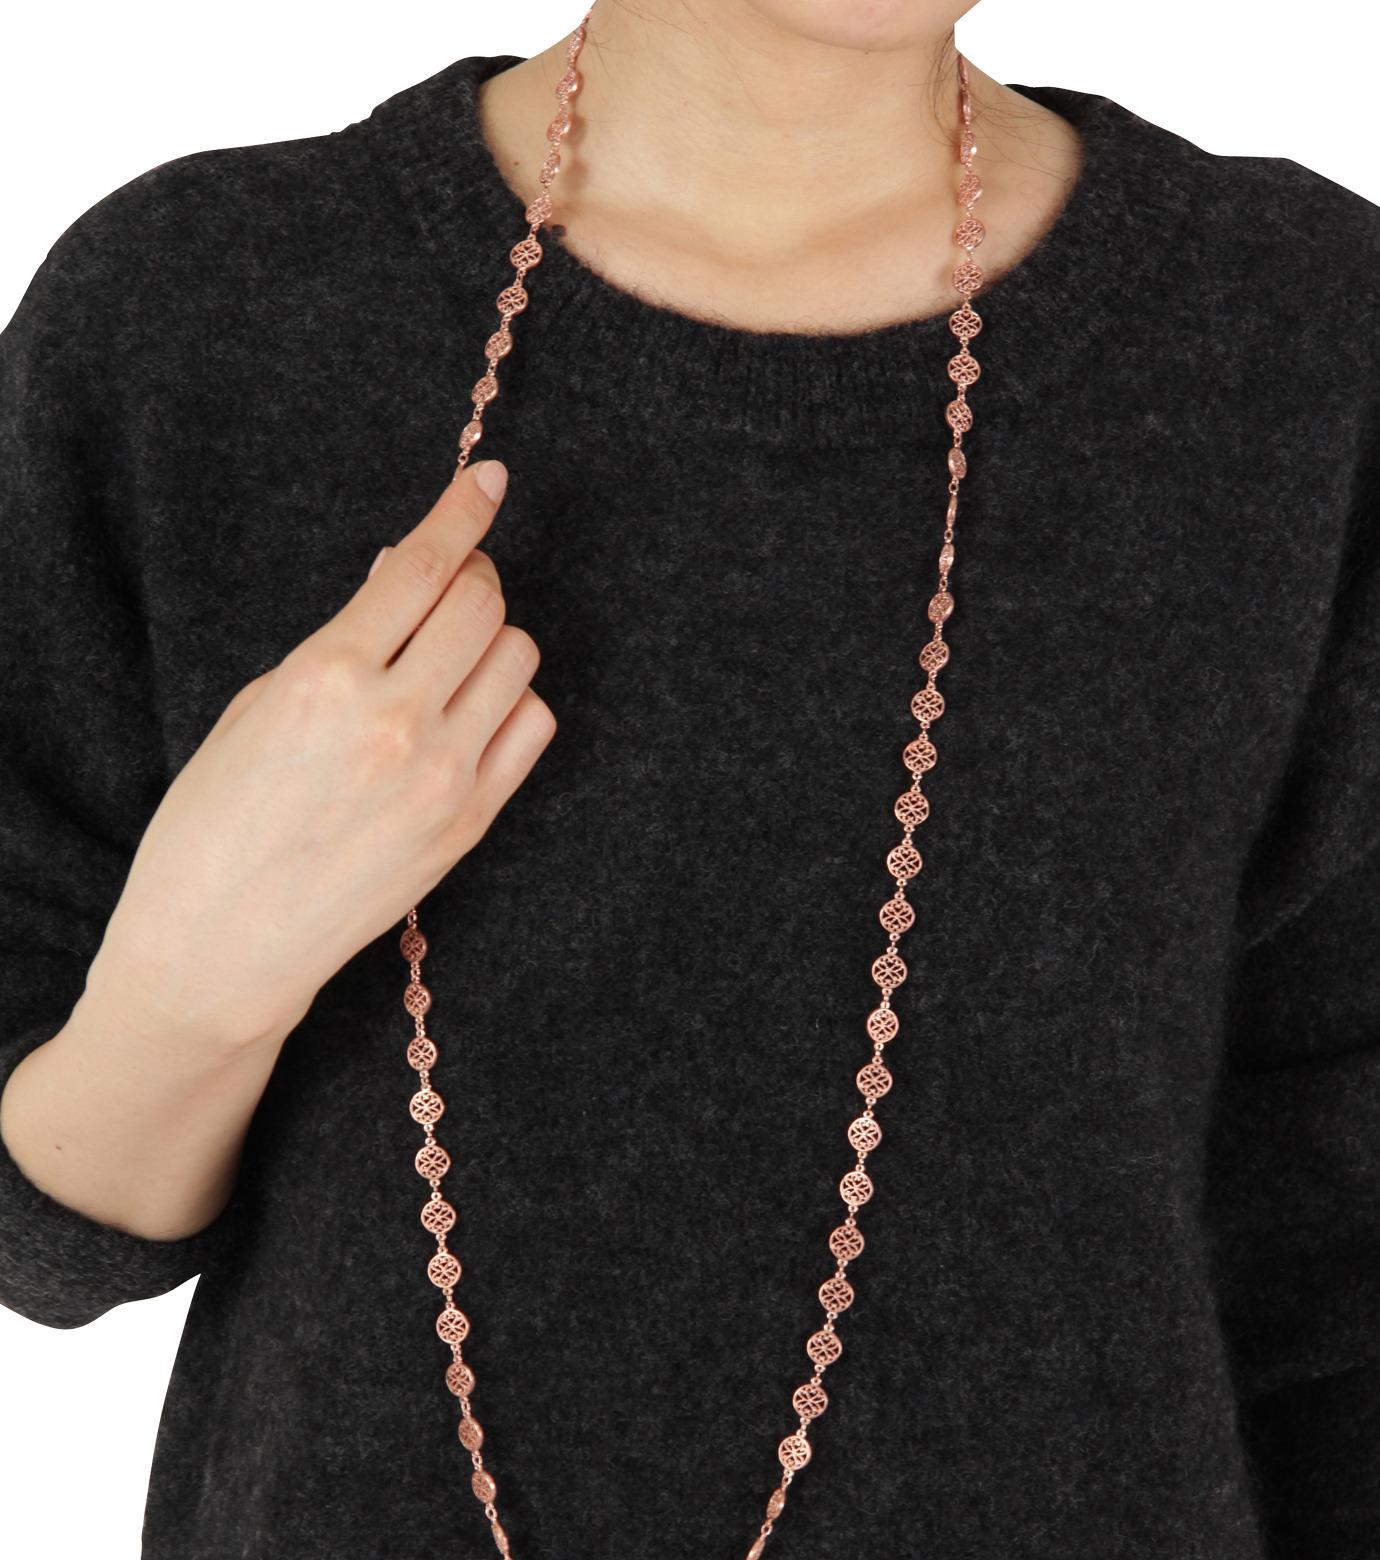 I AM by Ileana Makri(アイ アム バイ イリーナ マクリ)のAntoinette Necklace-ROSE(ネックレス/necklace)-O804-62-099-75 拡大詳細画像3